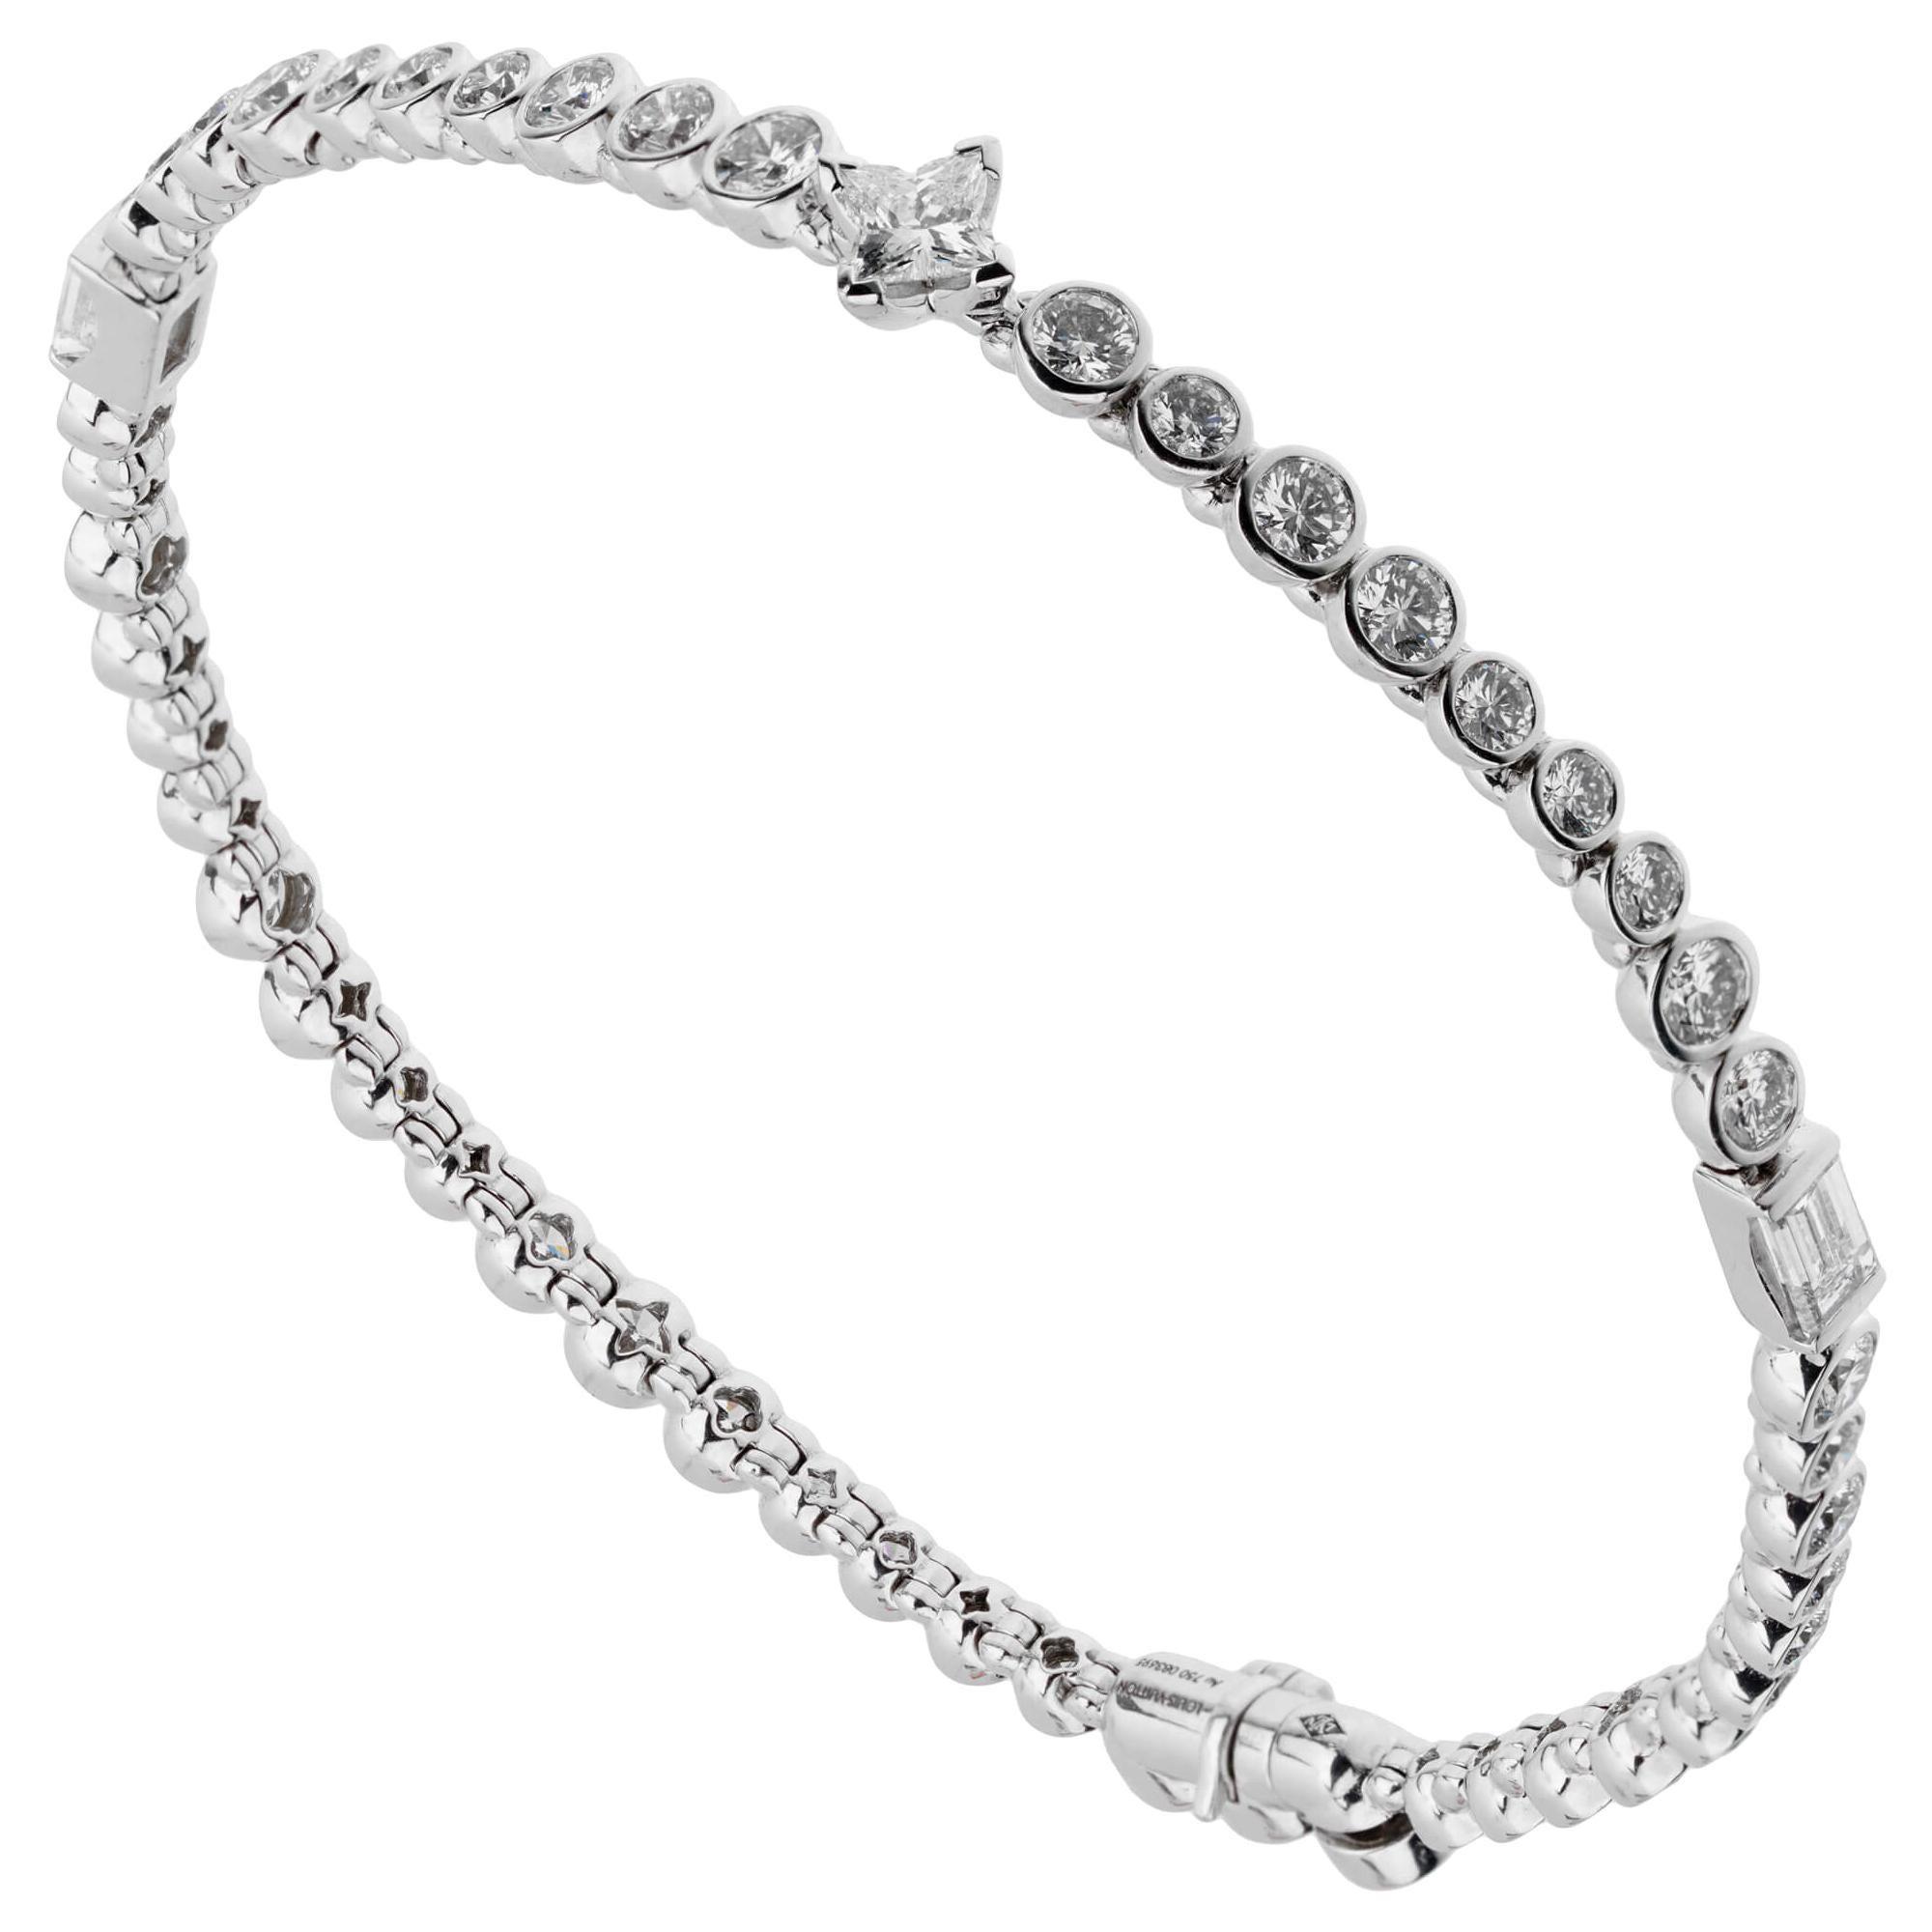 Louis Vuitton High Jewelry Diamond White Gold Tennis Bracelet